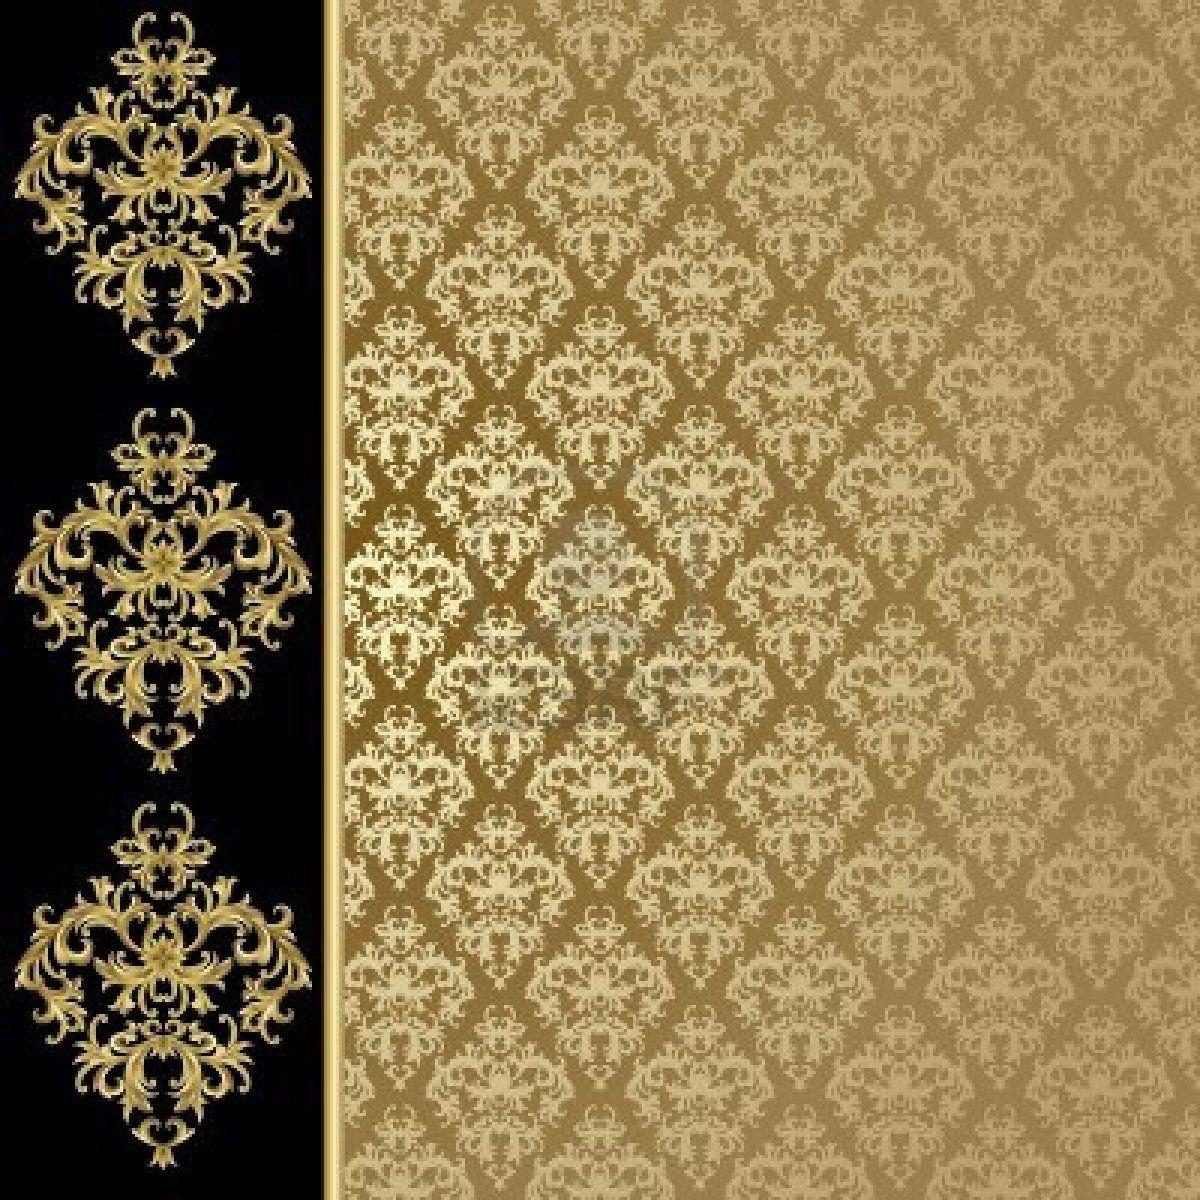 Stock Vector Gold background, Golden background